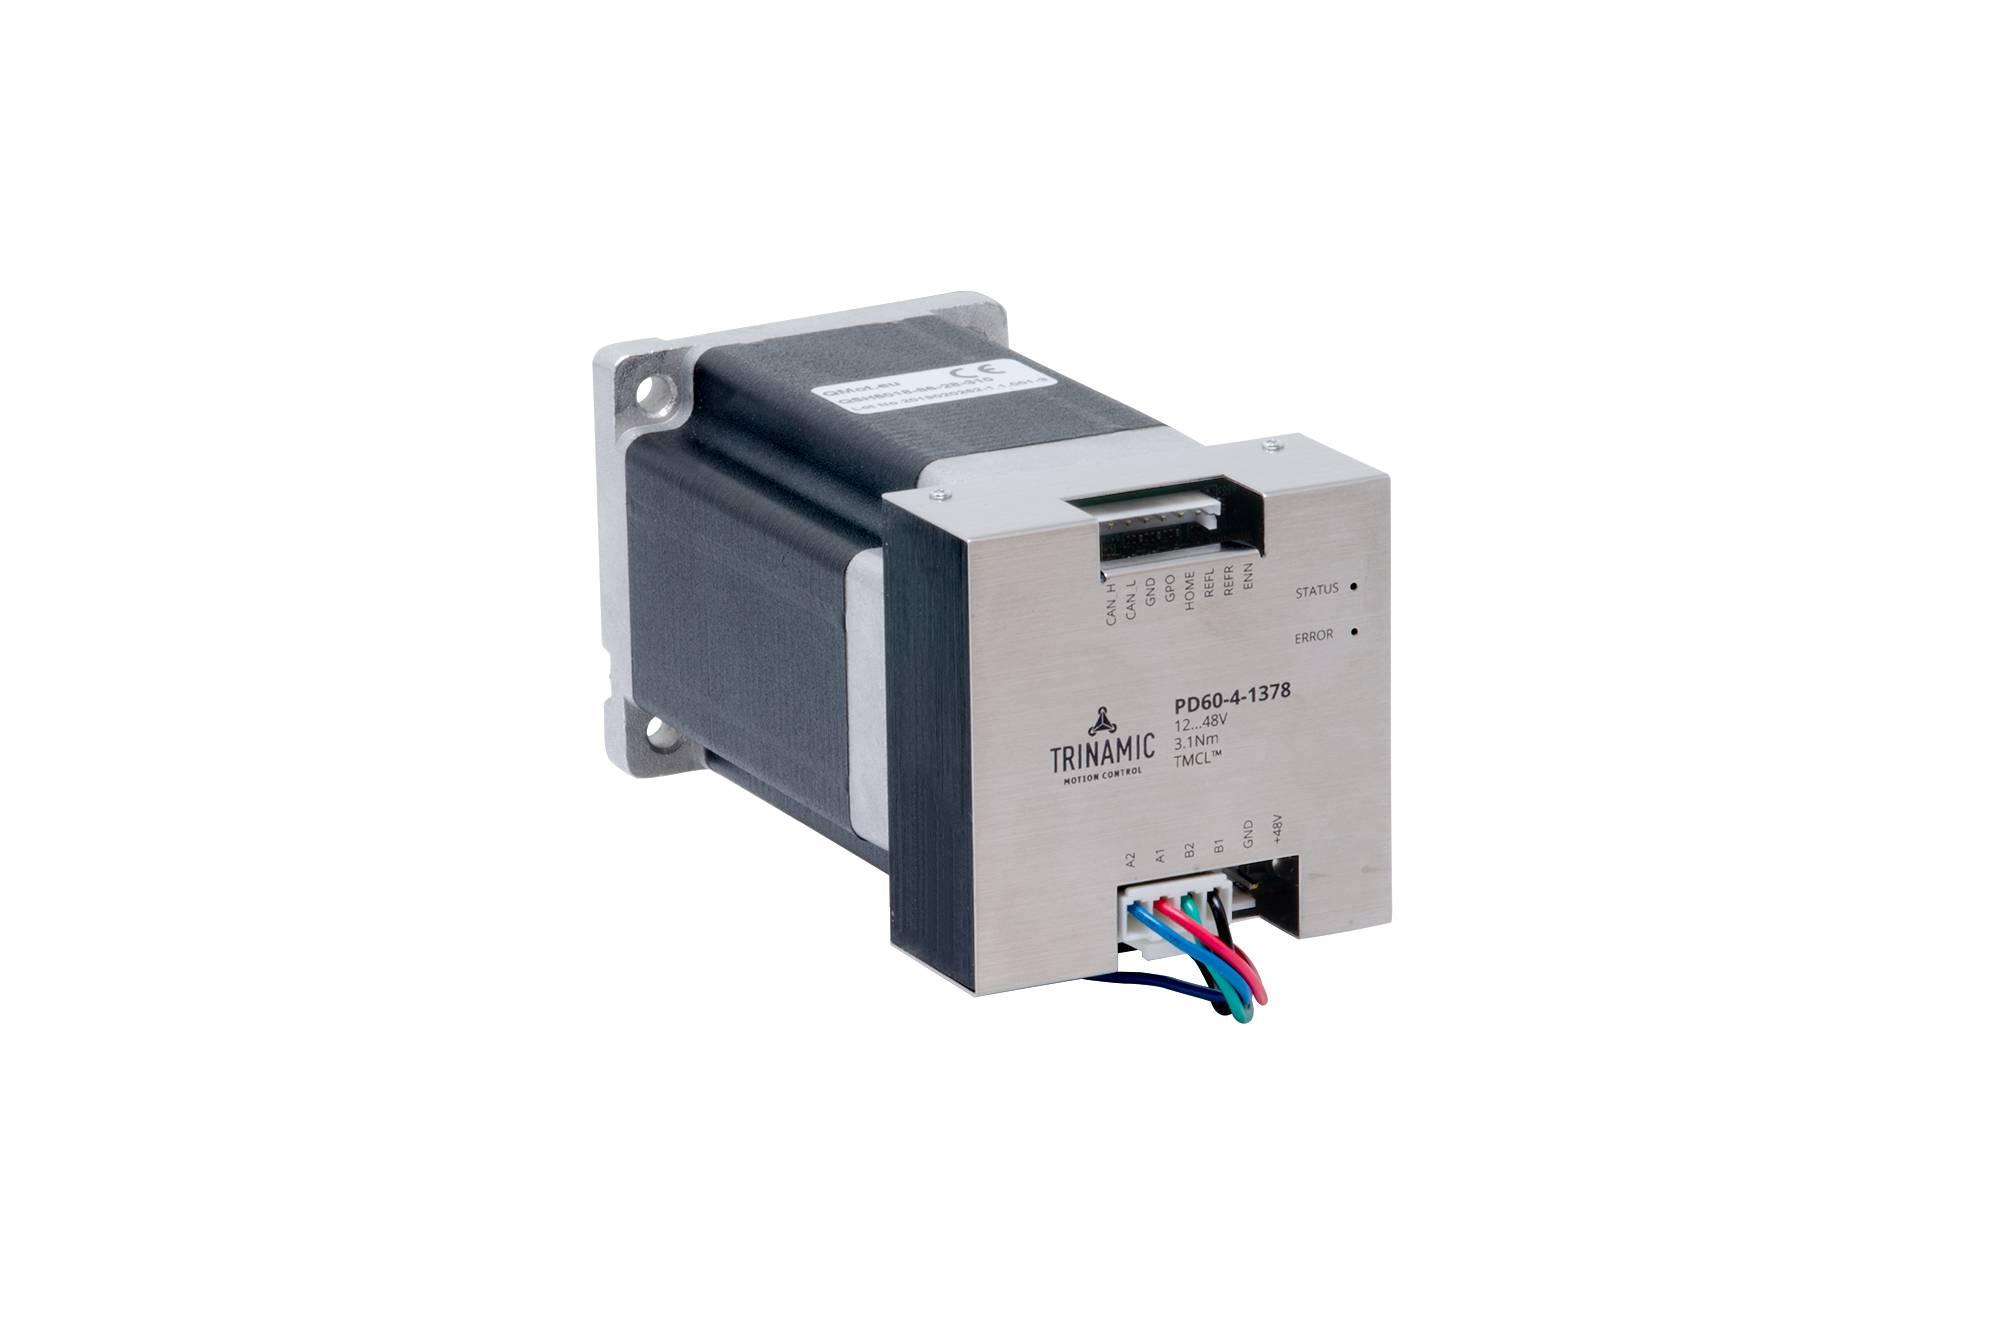 PD60-4-1378-TMCL